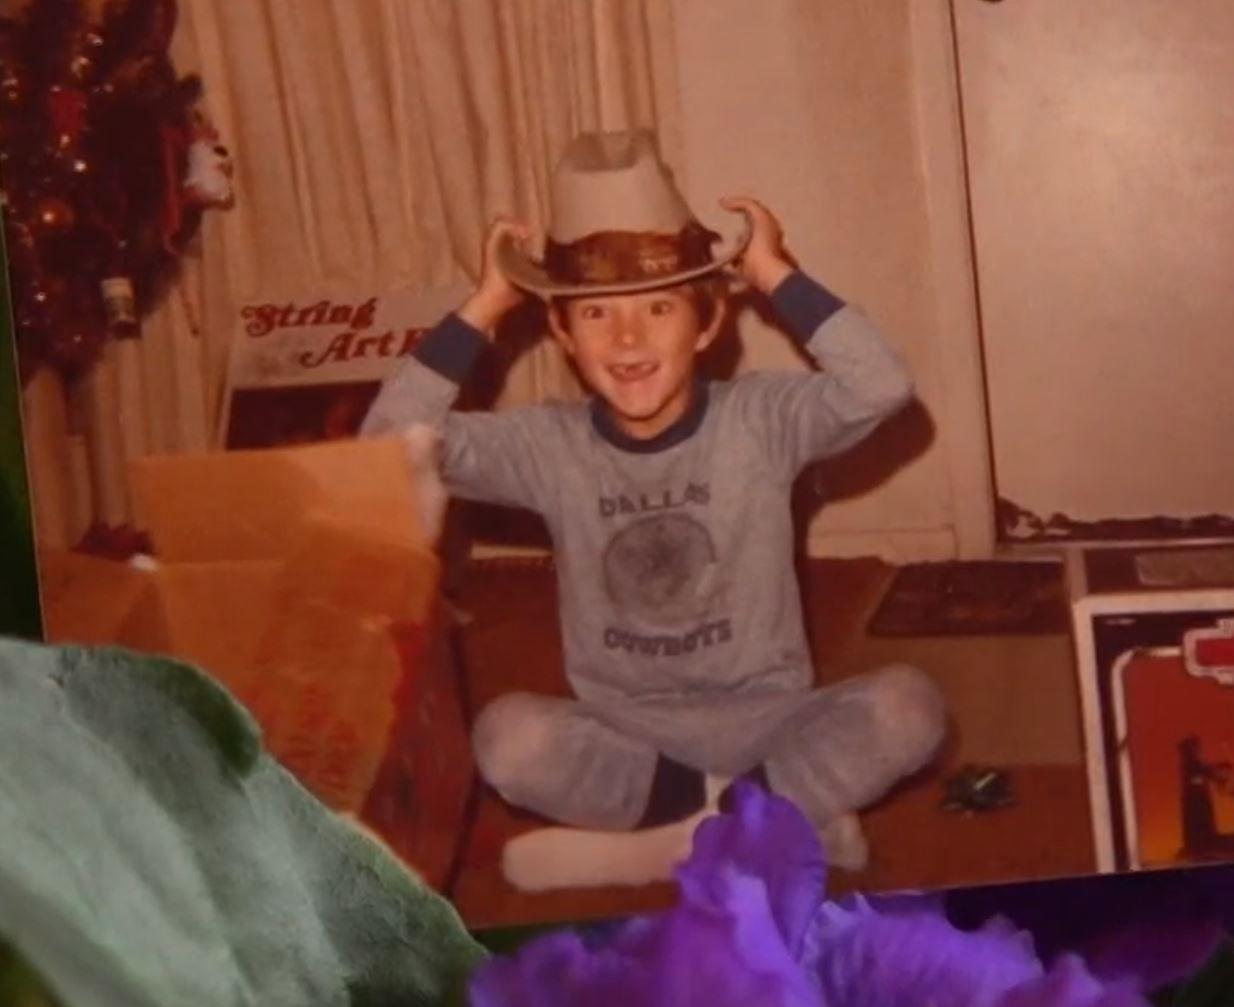 Jeremy Delle as a child.